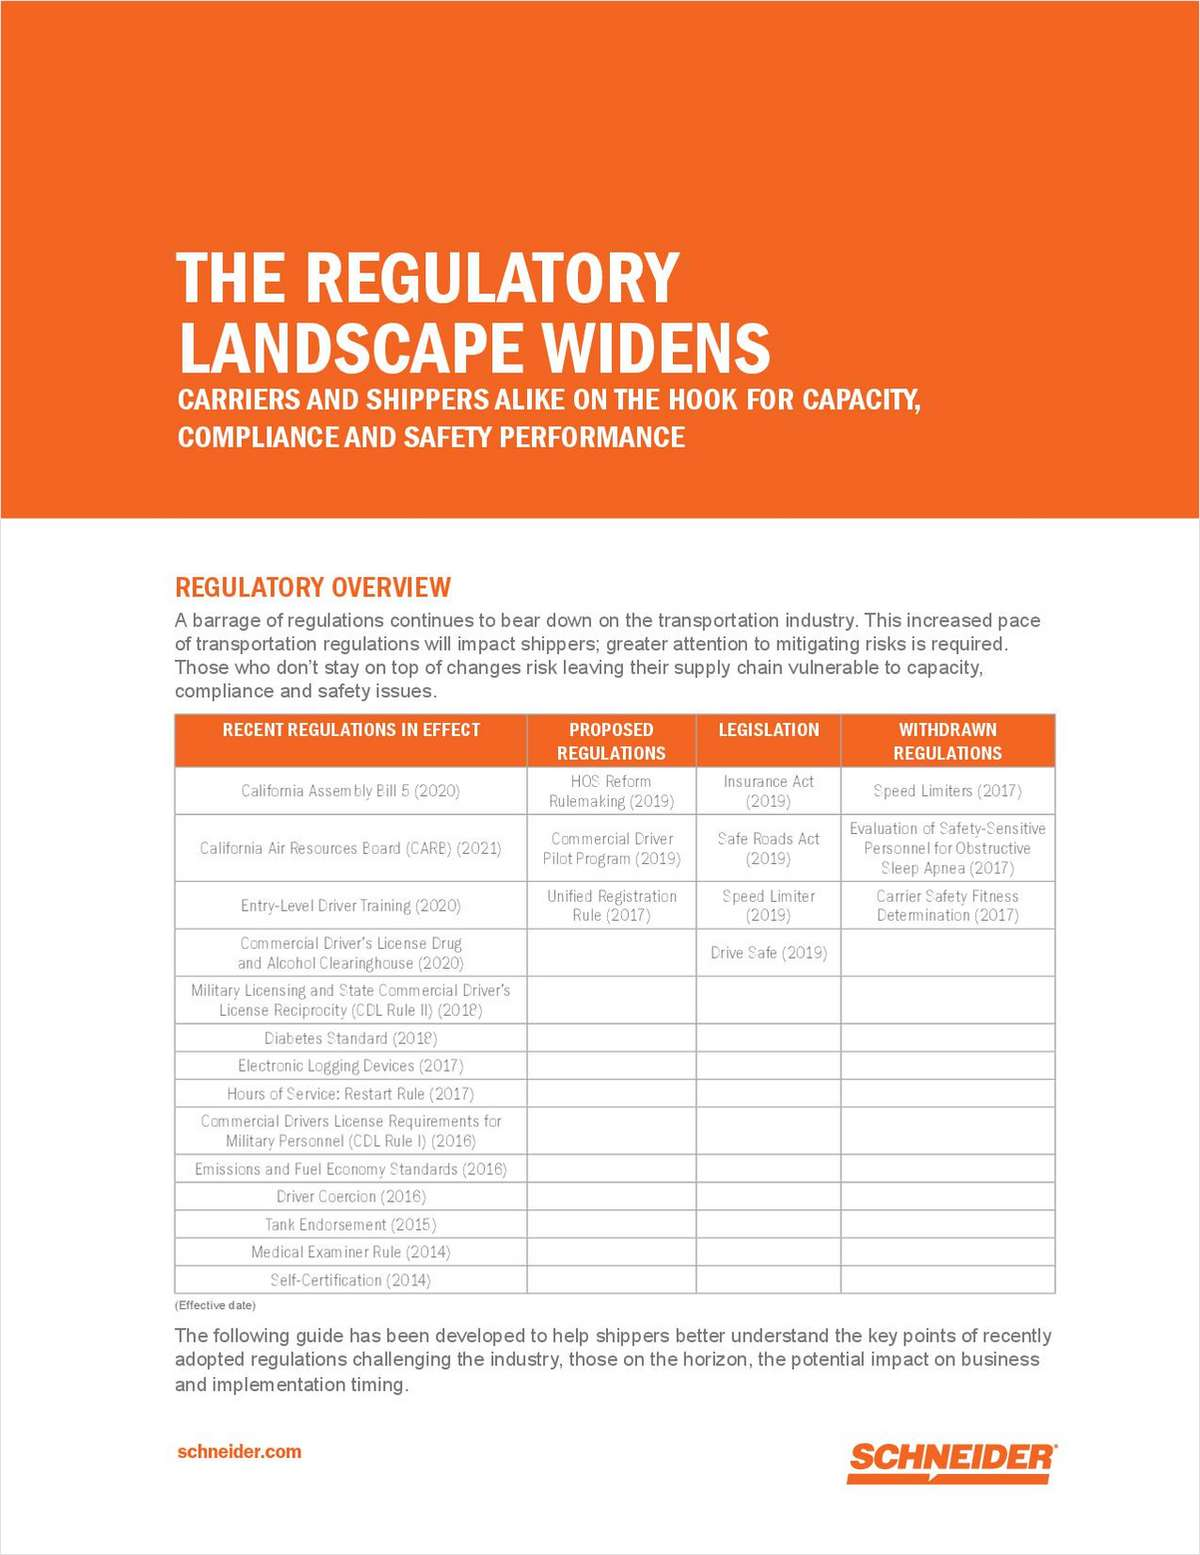 The Regulatory Landscape Widens